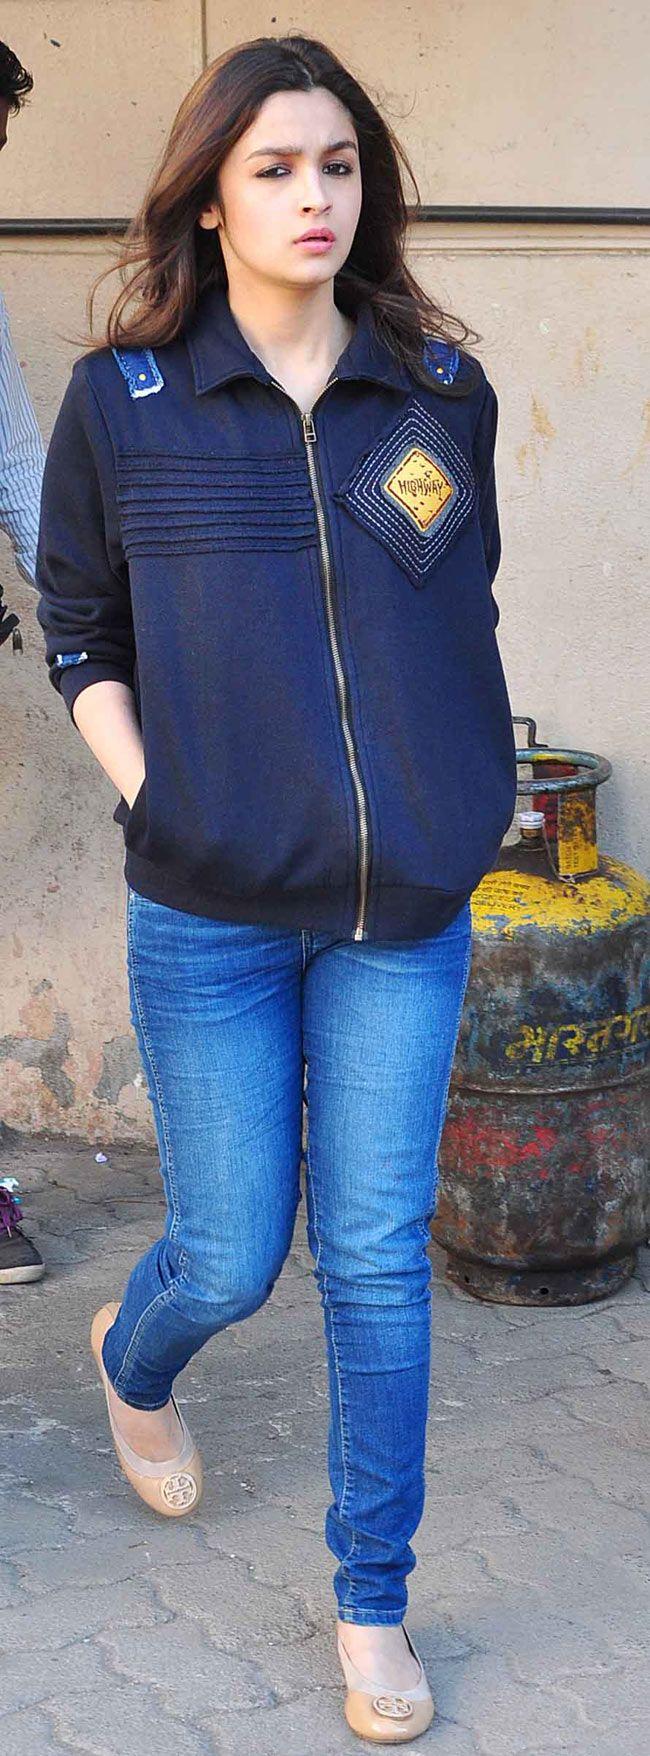 Alia Bhatt arriving at promo event for her film 'Highway'.